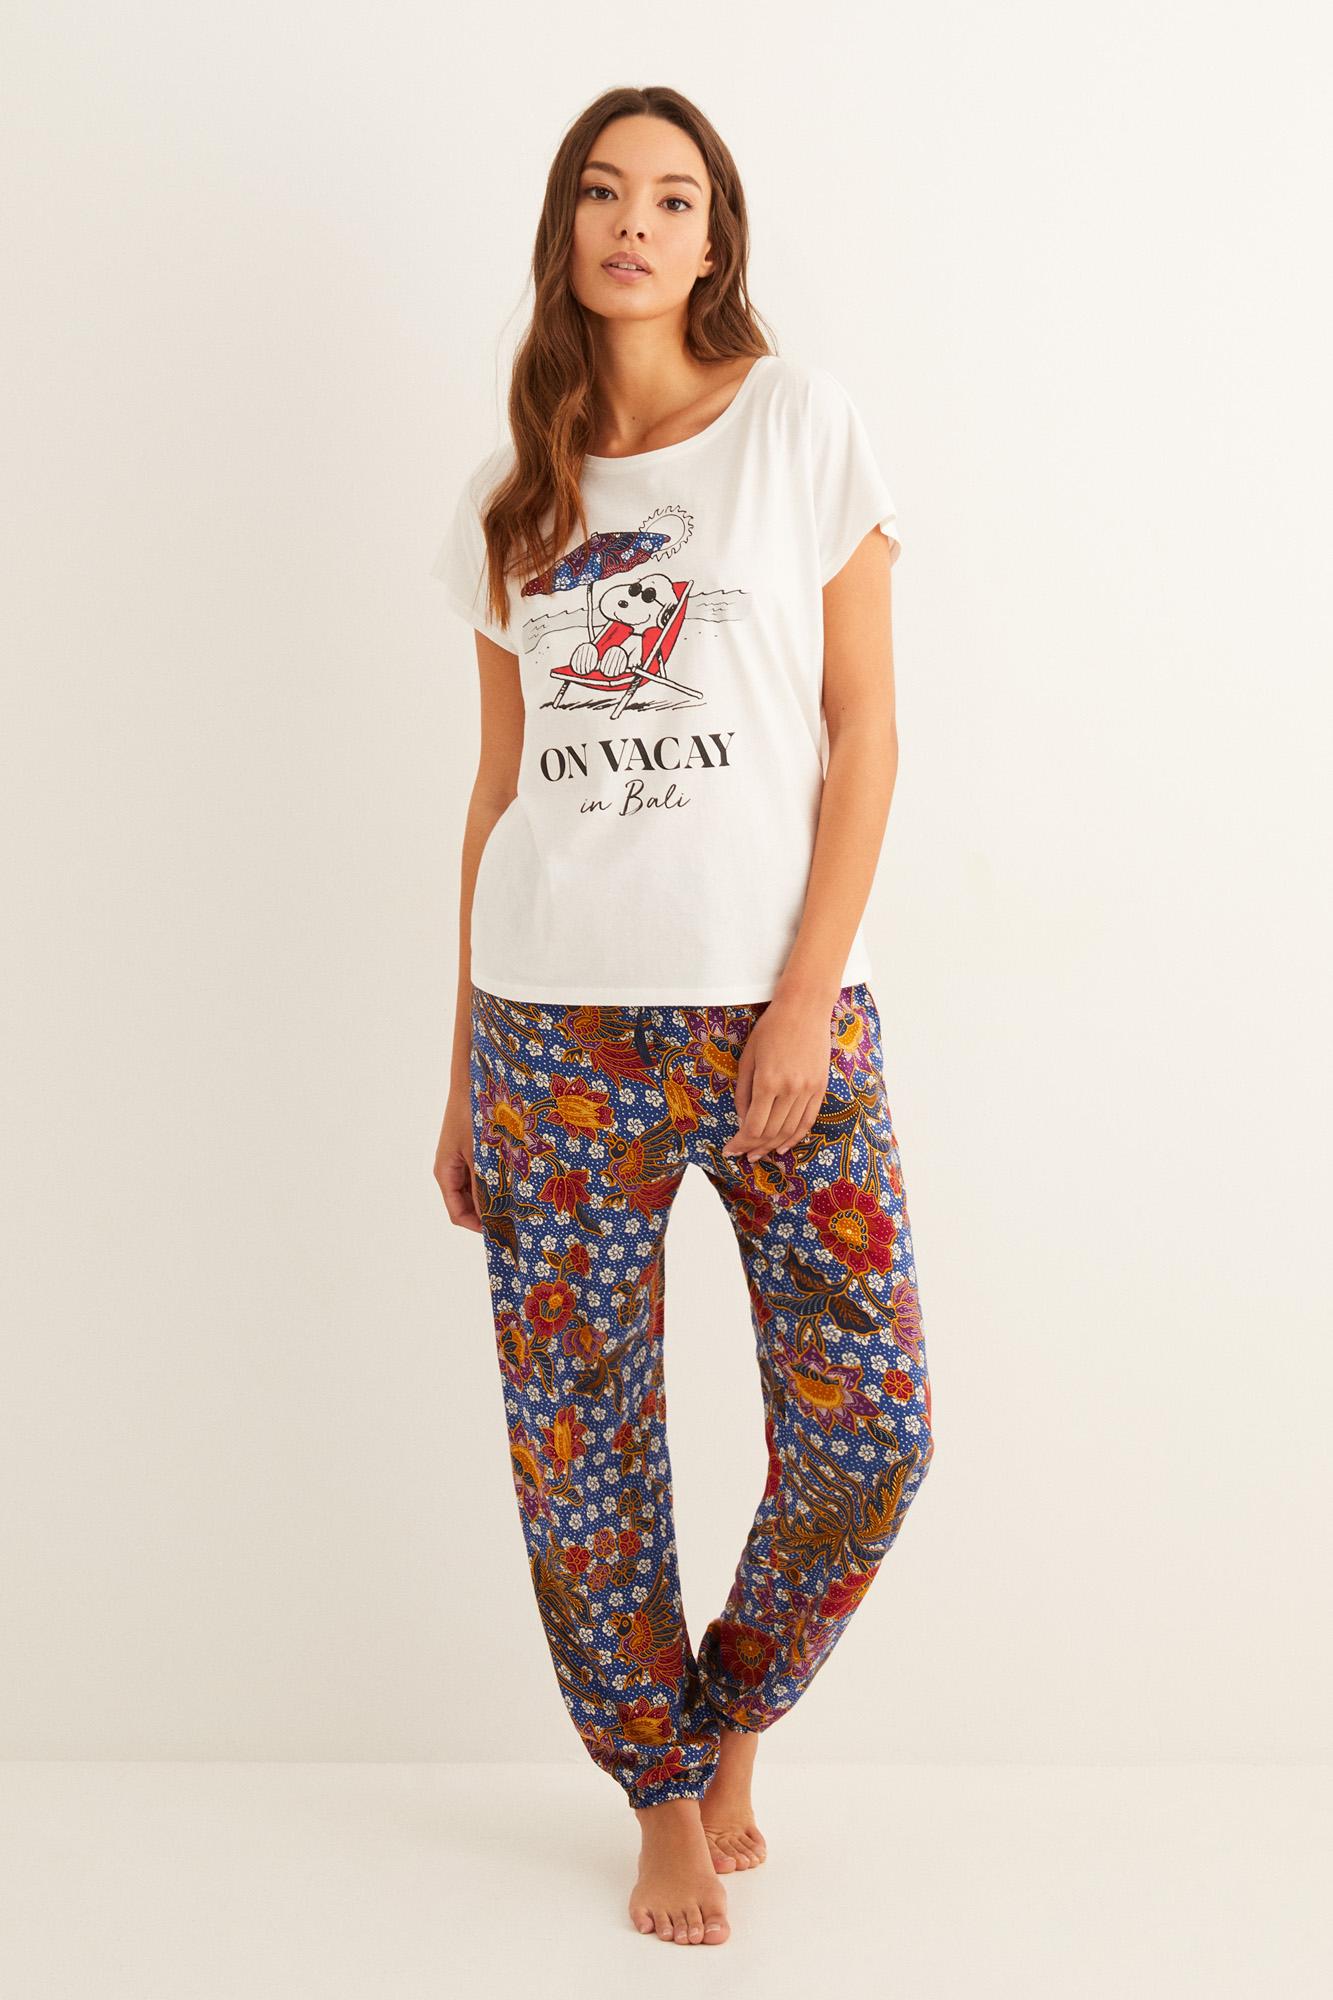 Pantalón largo estampado   Pantalones   Women'secret